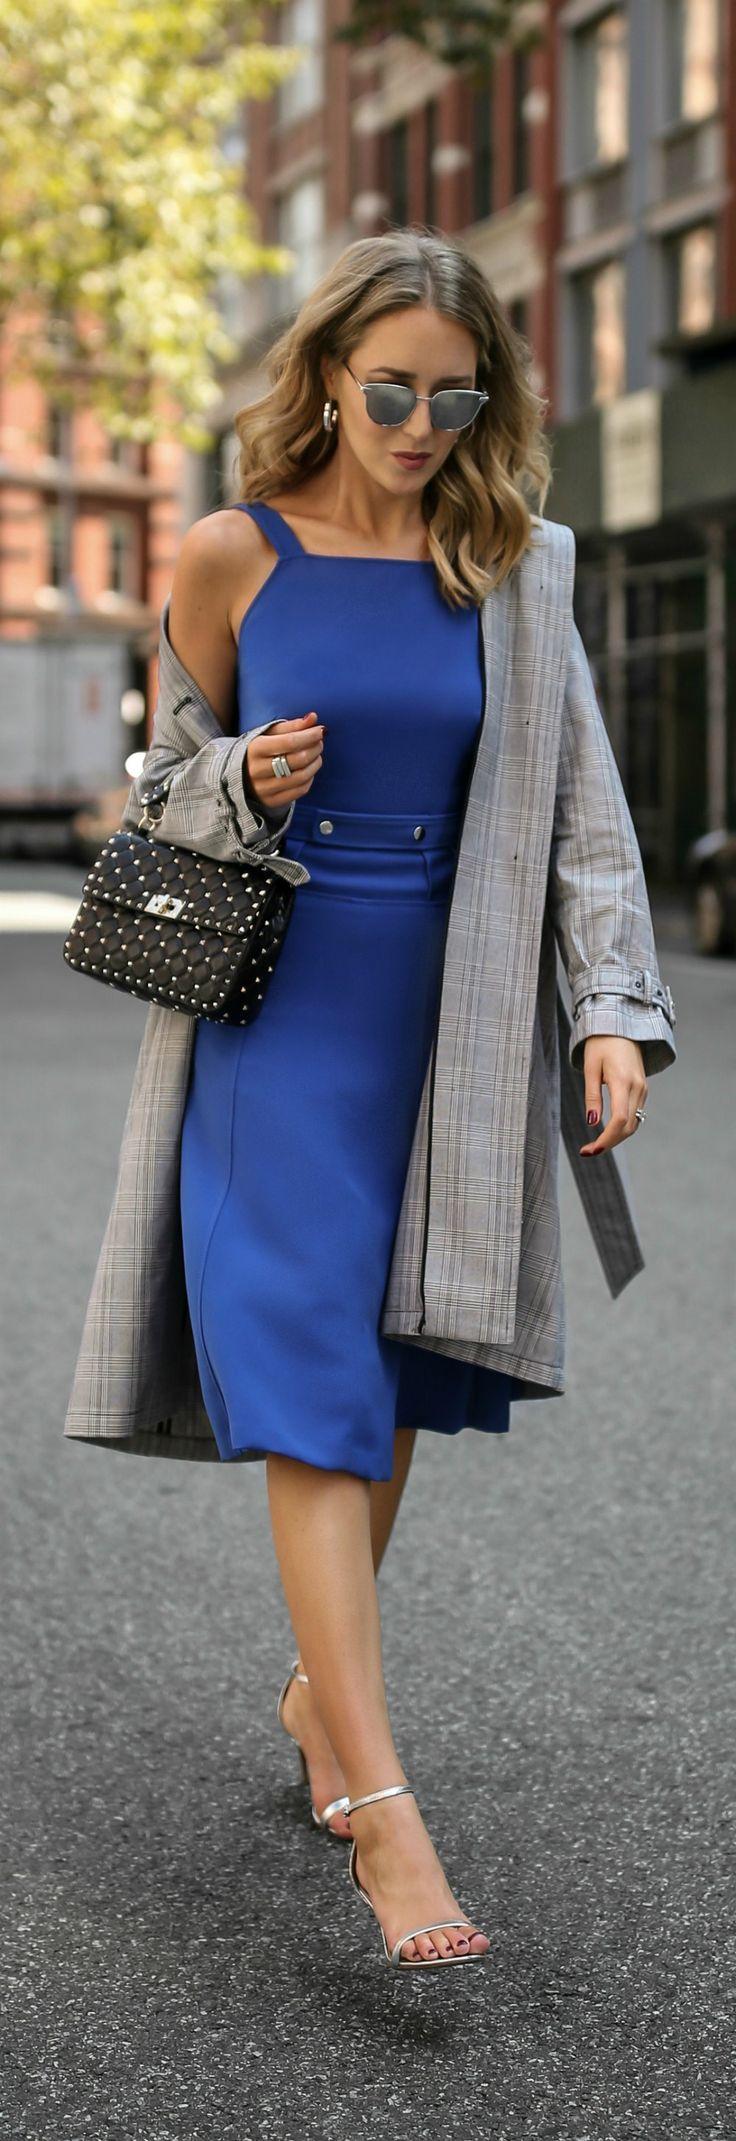 Cobalt Dress + Checked Trench // Cobalt blue belted dress, checked trench coat, leather shoulder bag, black ankle strap sandals, mirrored sunglasses {GREY Jason Wu, Zara, Valentino, Sam Edelman, fashion week}